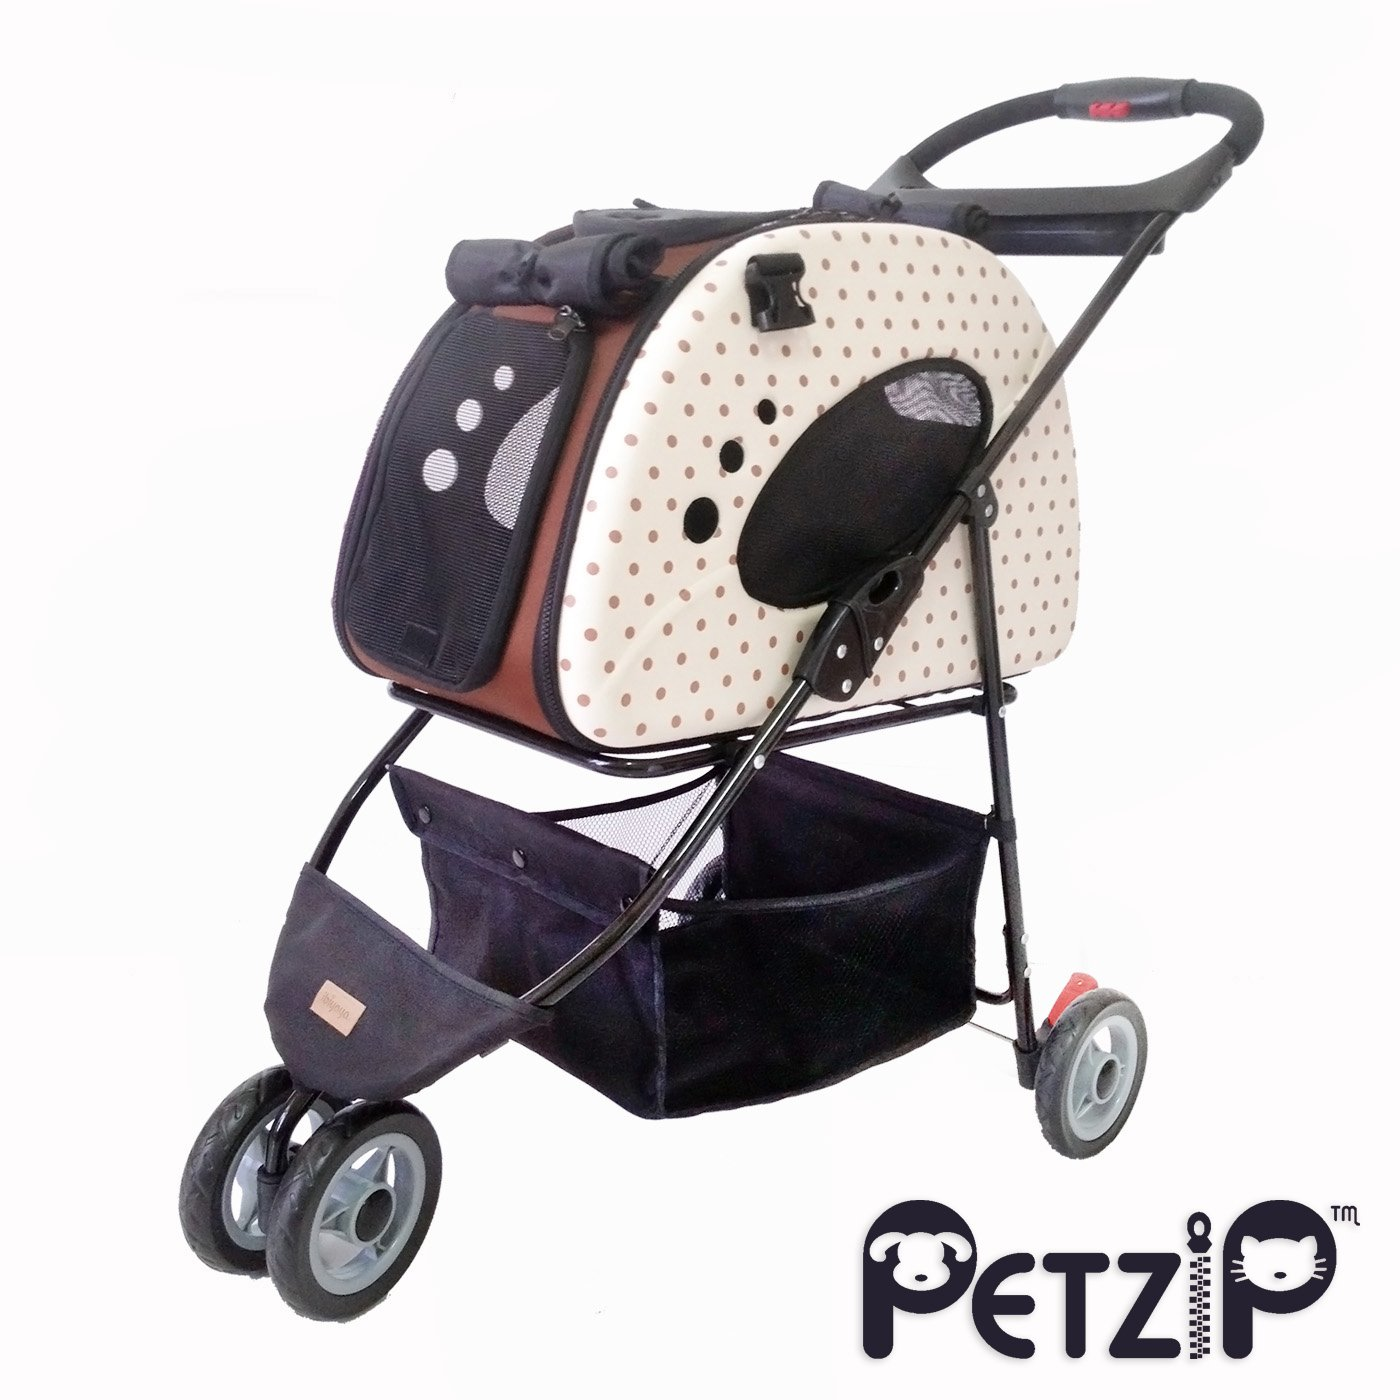 Petzip Fs1211-B Mochi Pet Carrier/Stroller, Small, Beige by Petzip